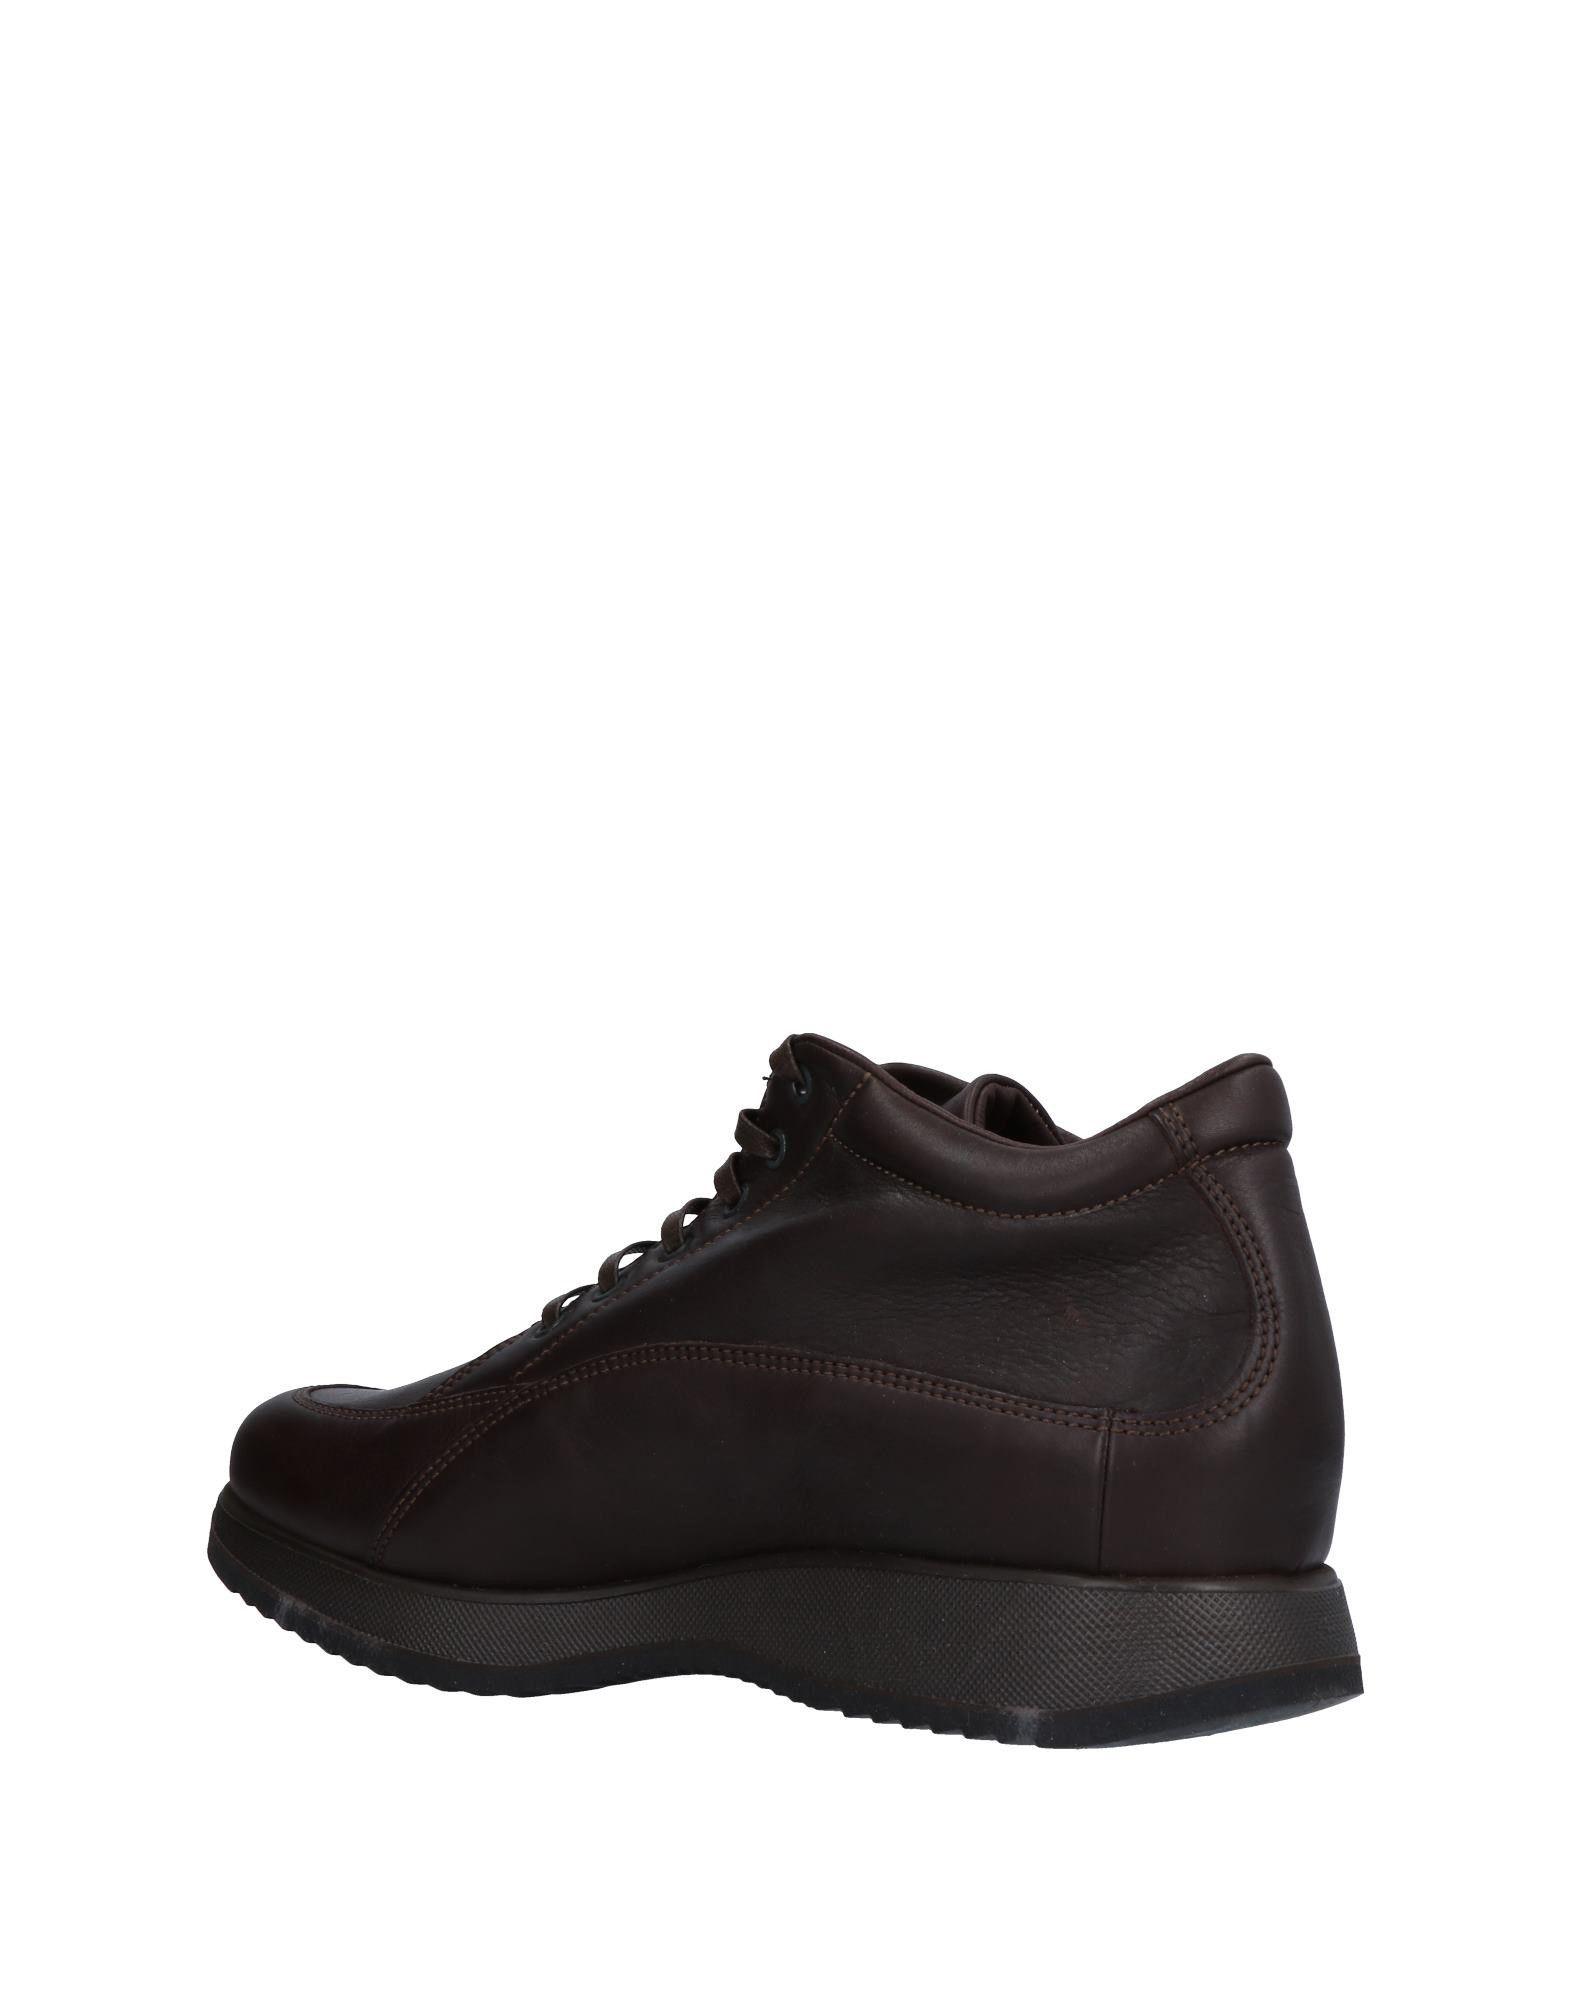 Rabatt echte  Schuhe Barleycorn Sneakers Herren  echte 11504414DE 746f6e